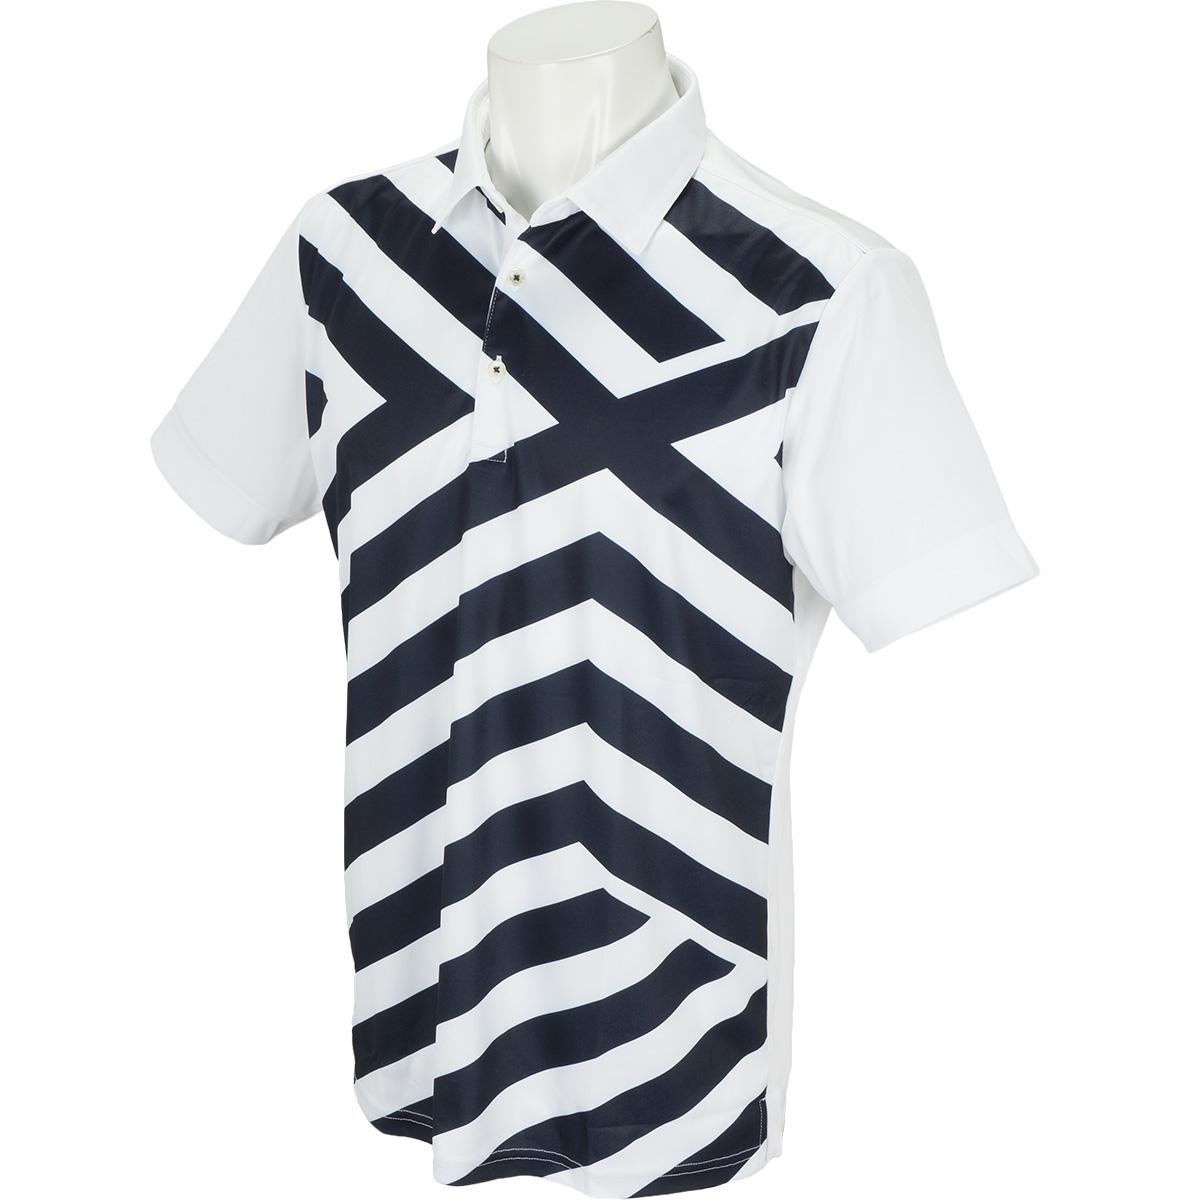 WhiteLabel COOLMAX鹿の子パネルクロスプリント半袖ポロシャツ